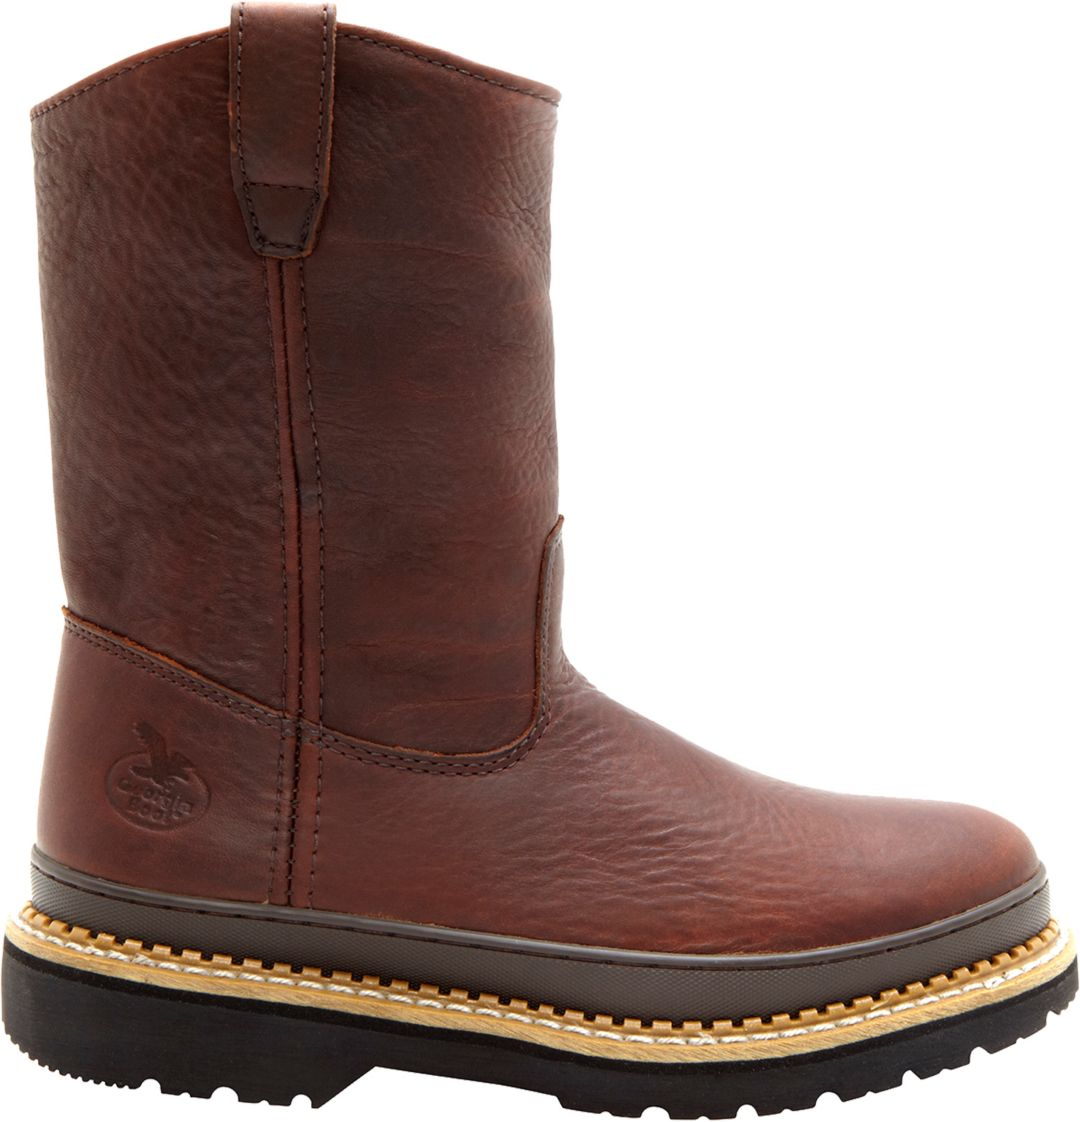 5699540e9d6 Georgia Boot Men's Giant Pull-On 9'' Wellington Steel Toe Work Boots